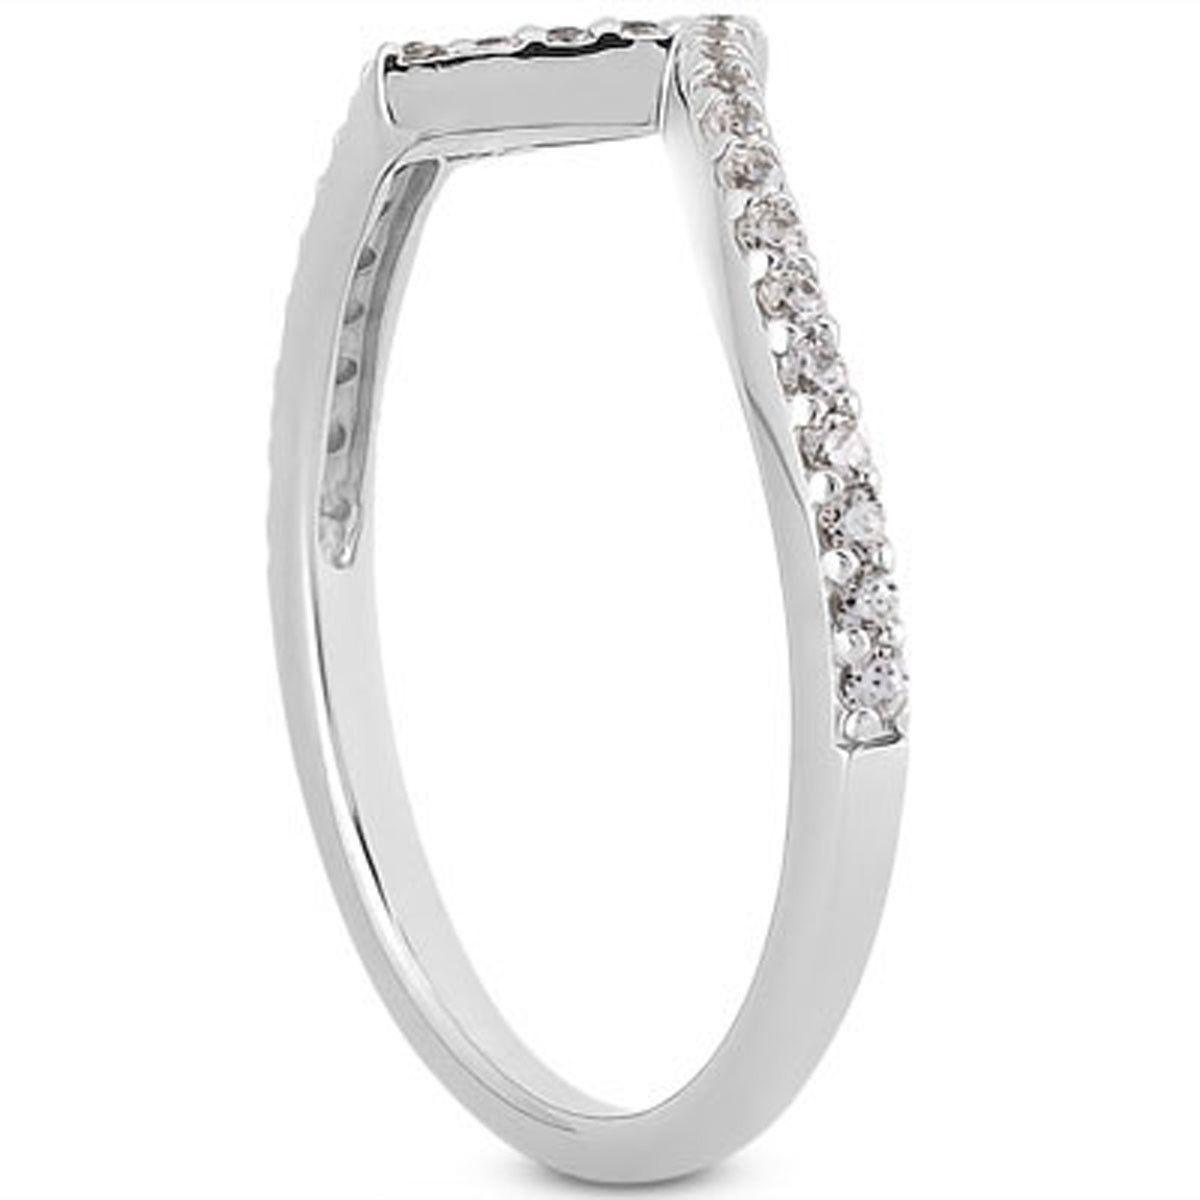 14K White Gold Fancy Zig Zag Pave Diamond Wedding Ring Band